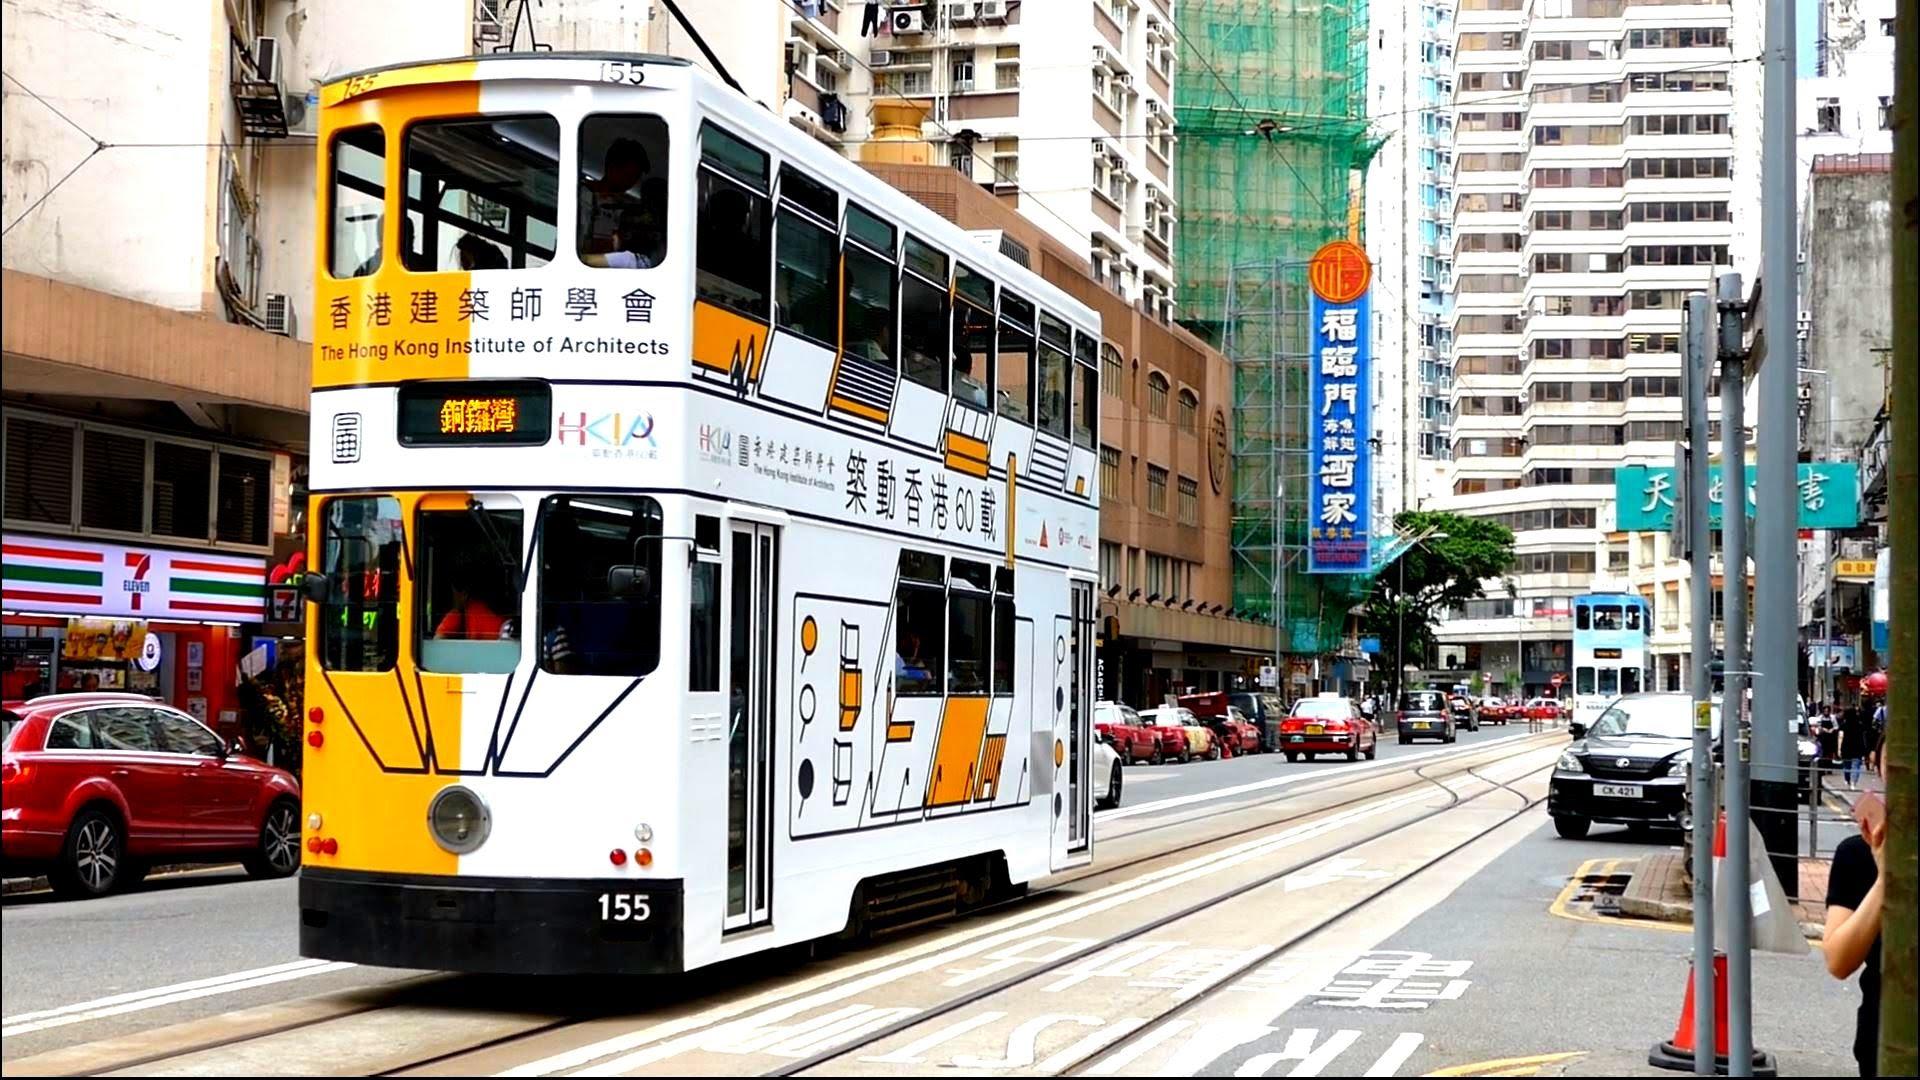 Hong Kong Tramways - Ding Ding Tram Ride - POV Video - YouTube